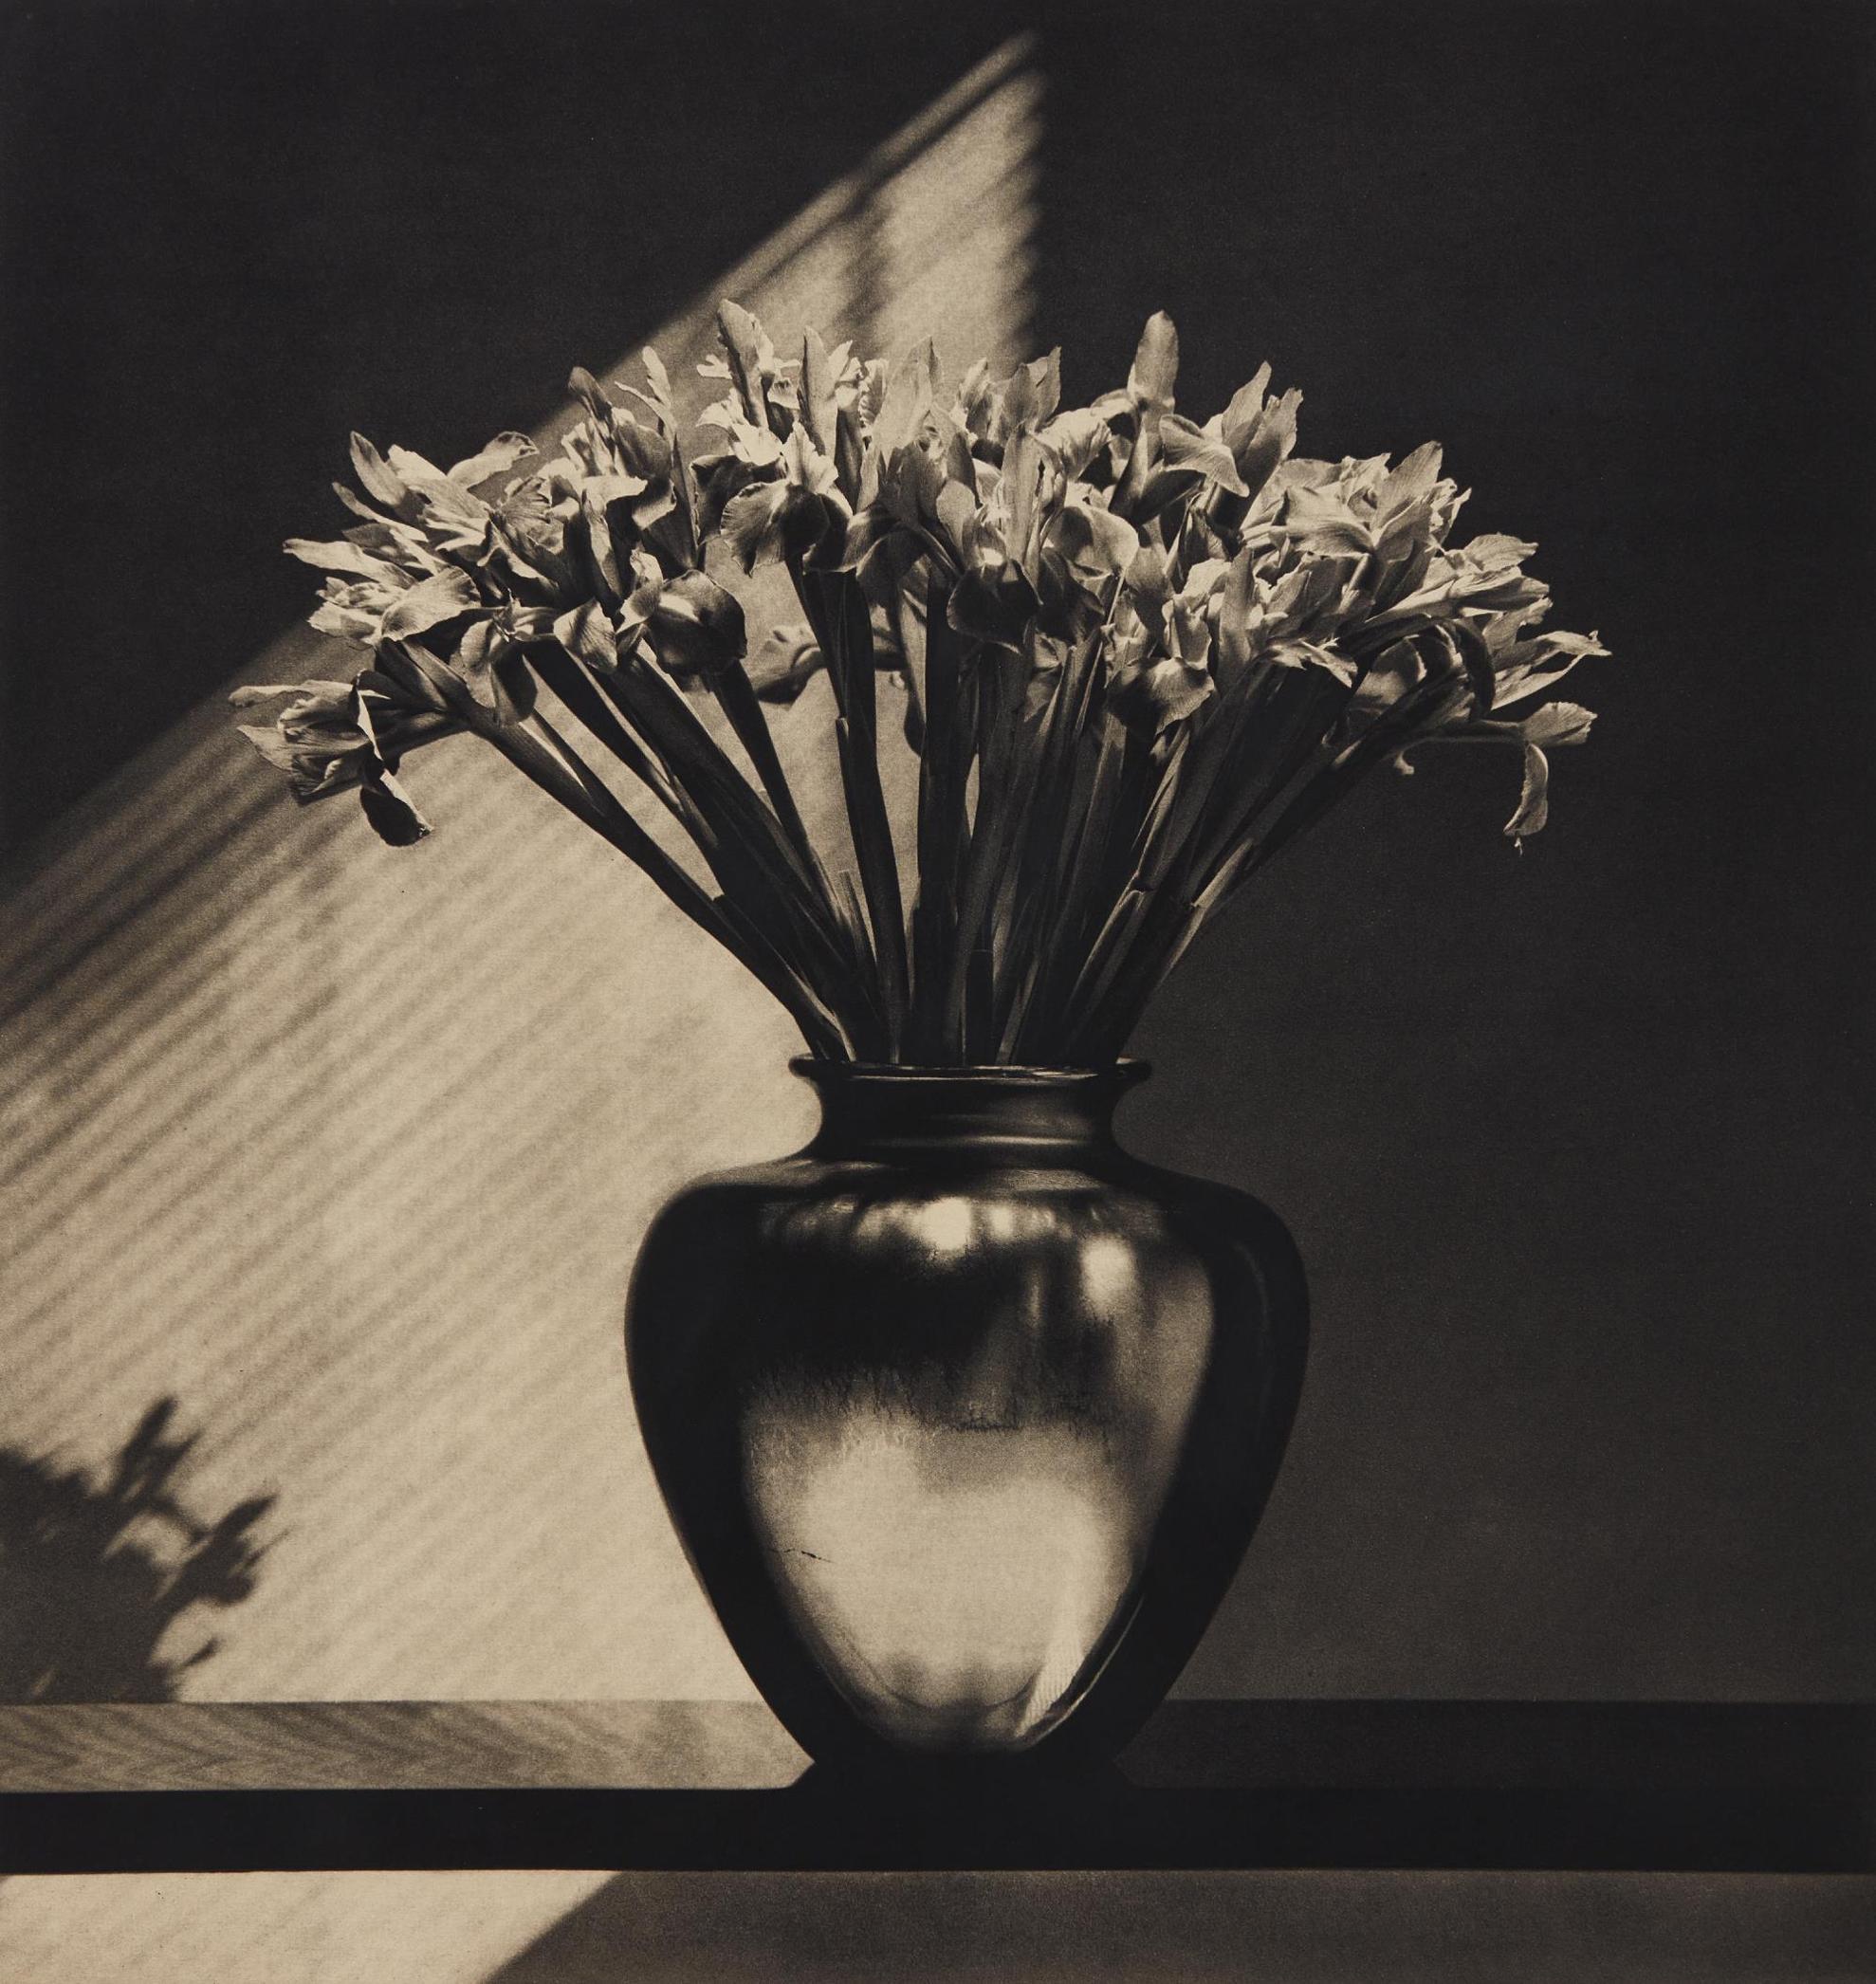 Robert Mapplethorpe-Irises-1986